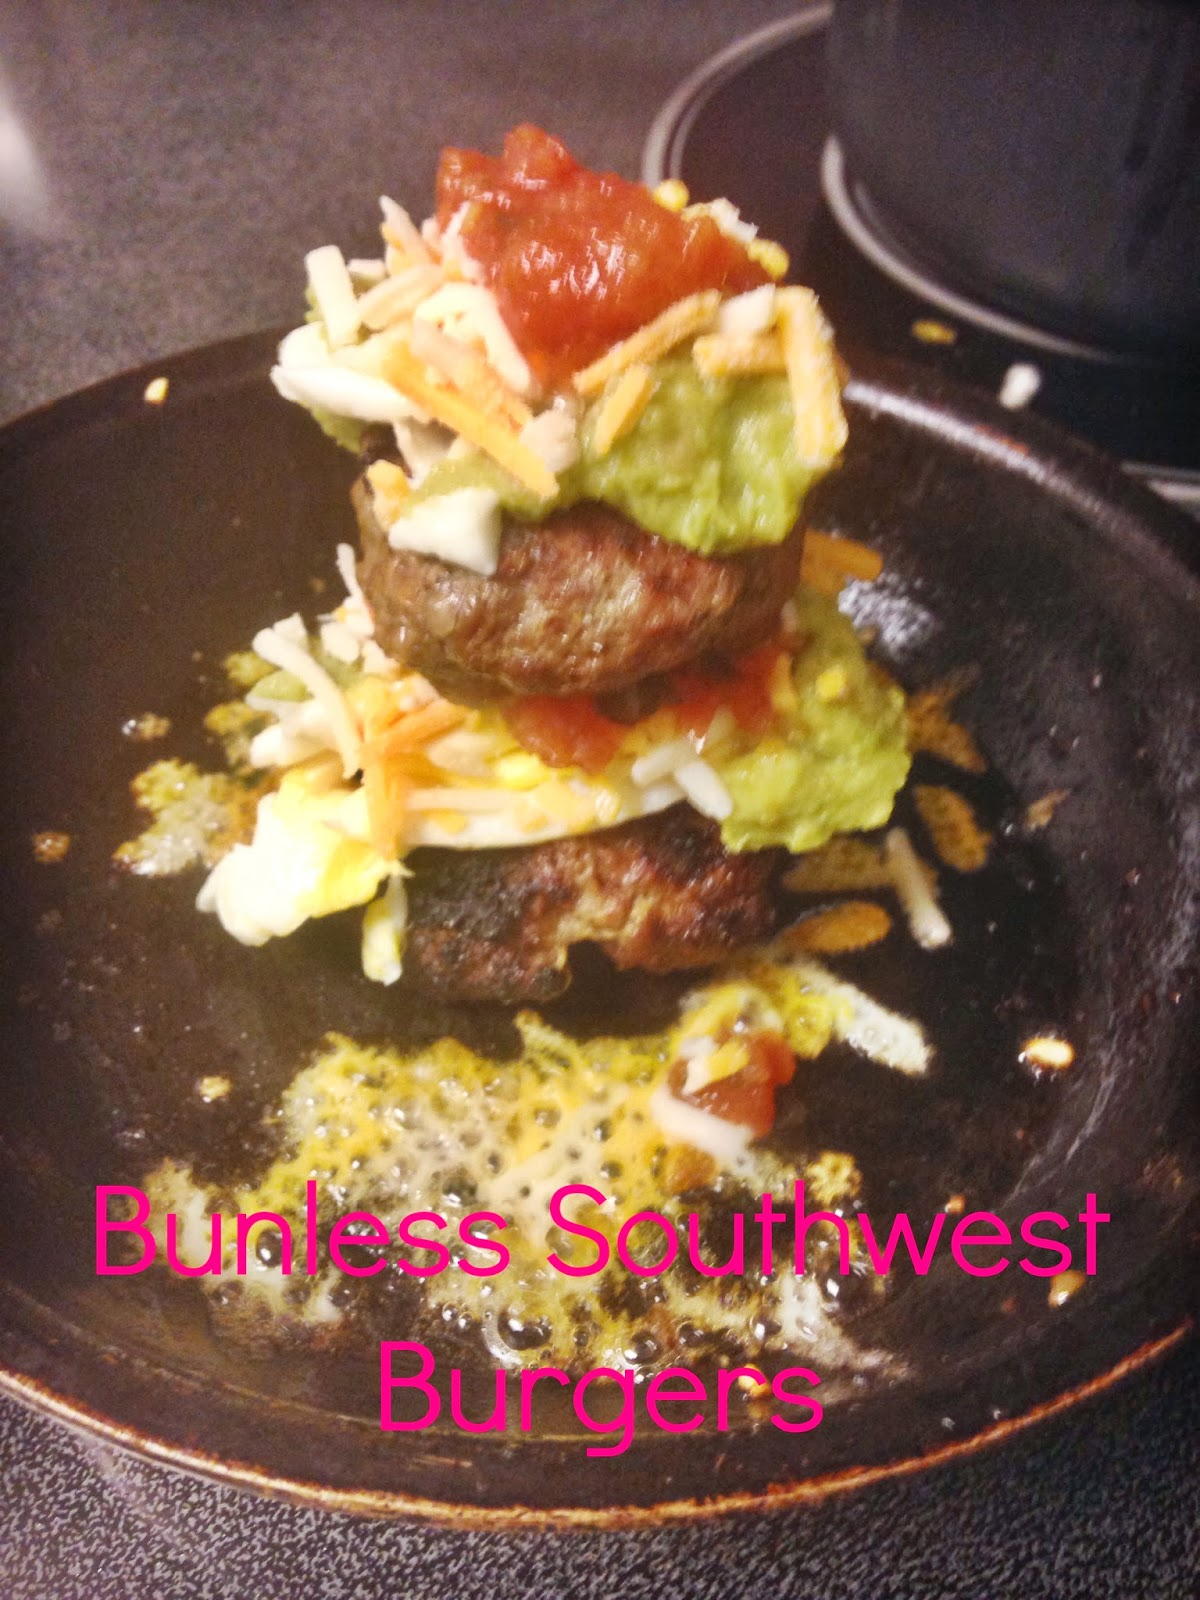 Bunless Southwest Burgers